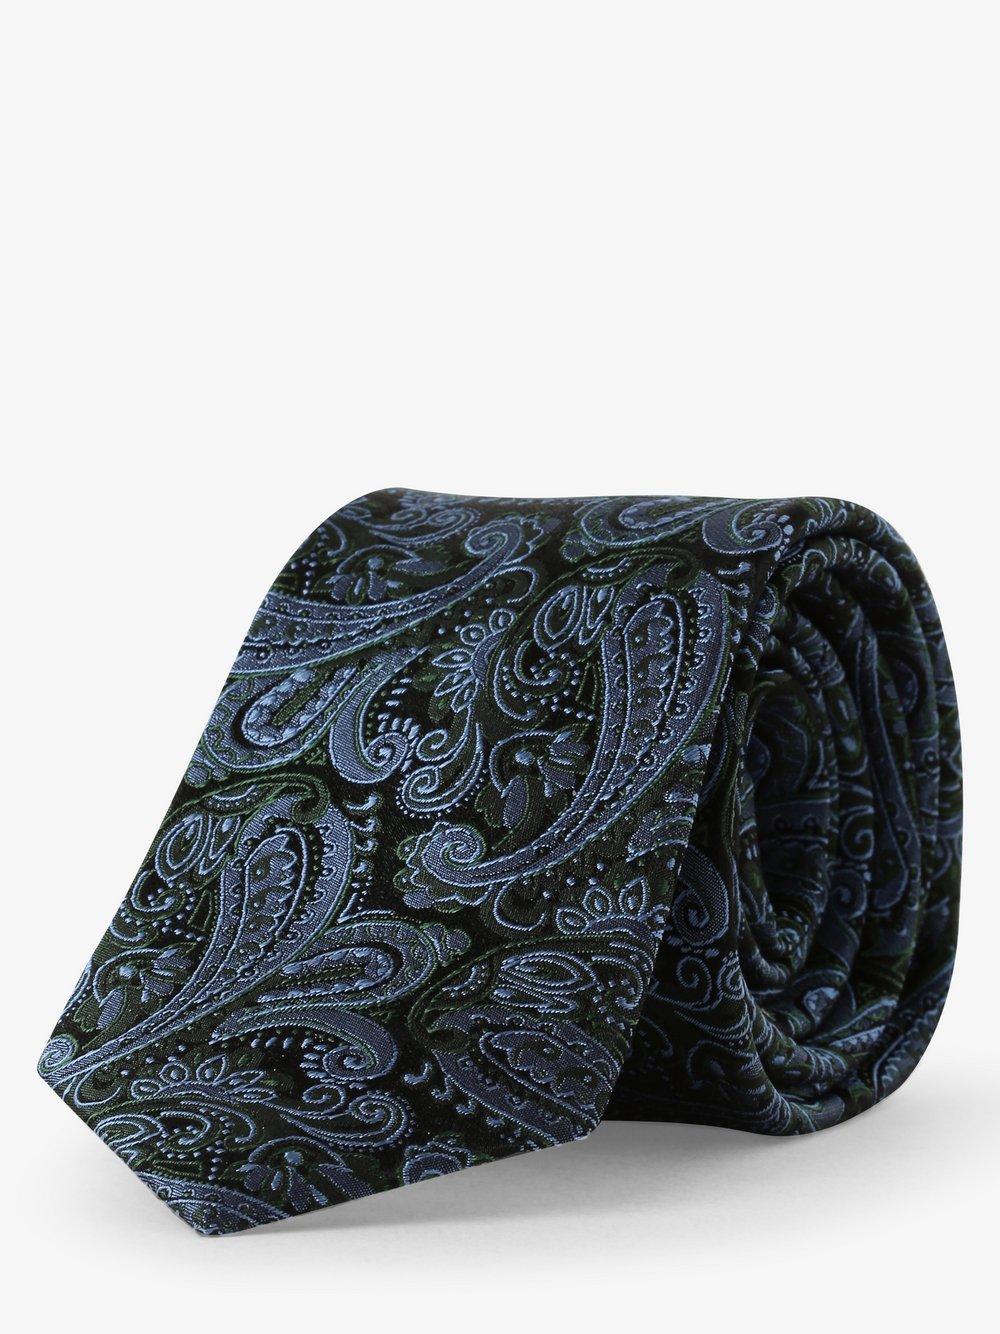 Andrew James – Krawat jedwabny męski, zielony Van Graaf 490933-0004-00000